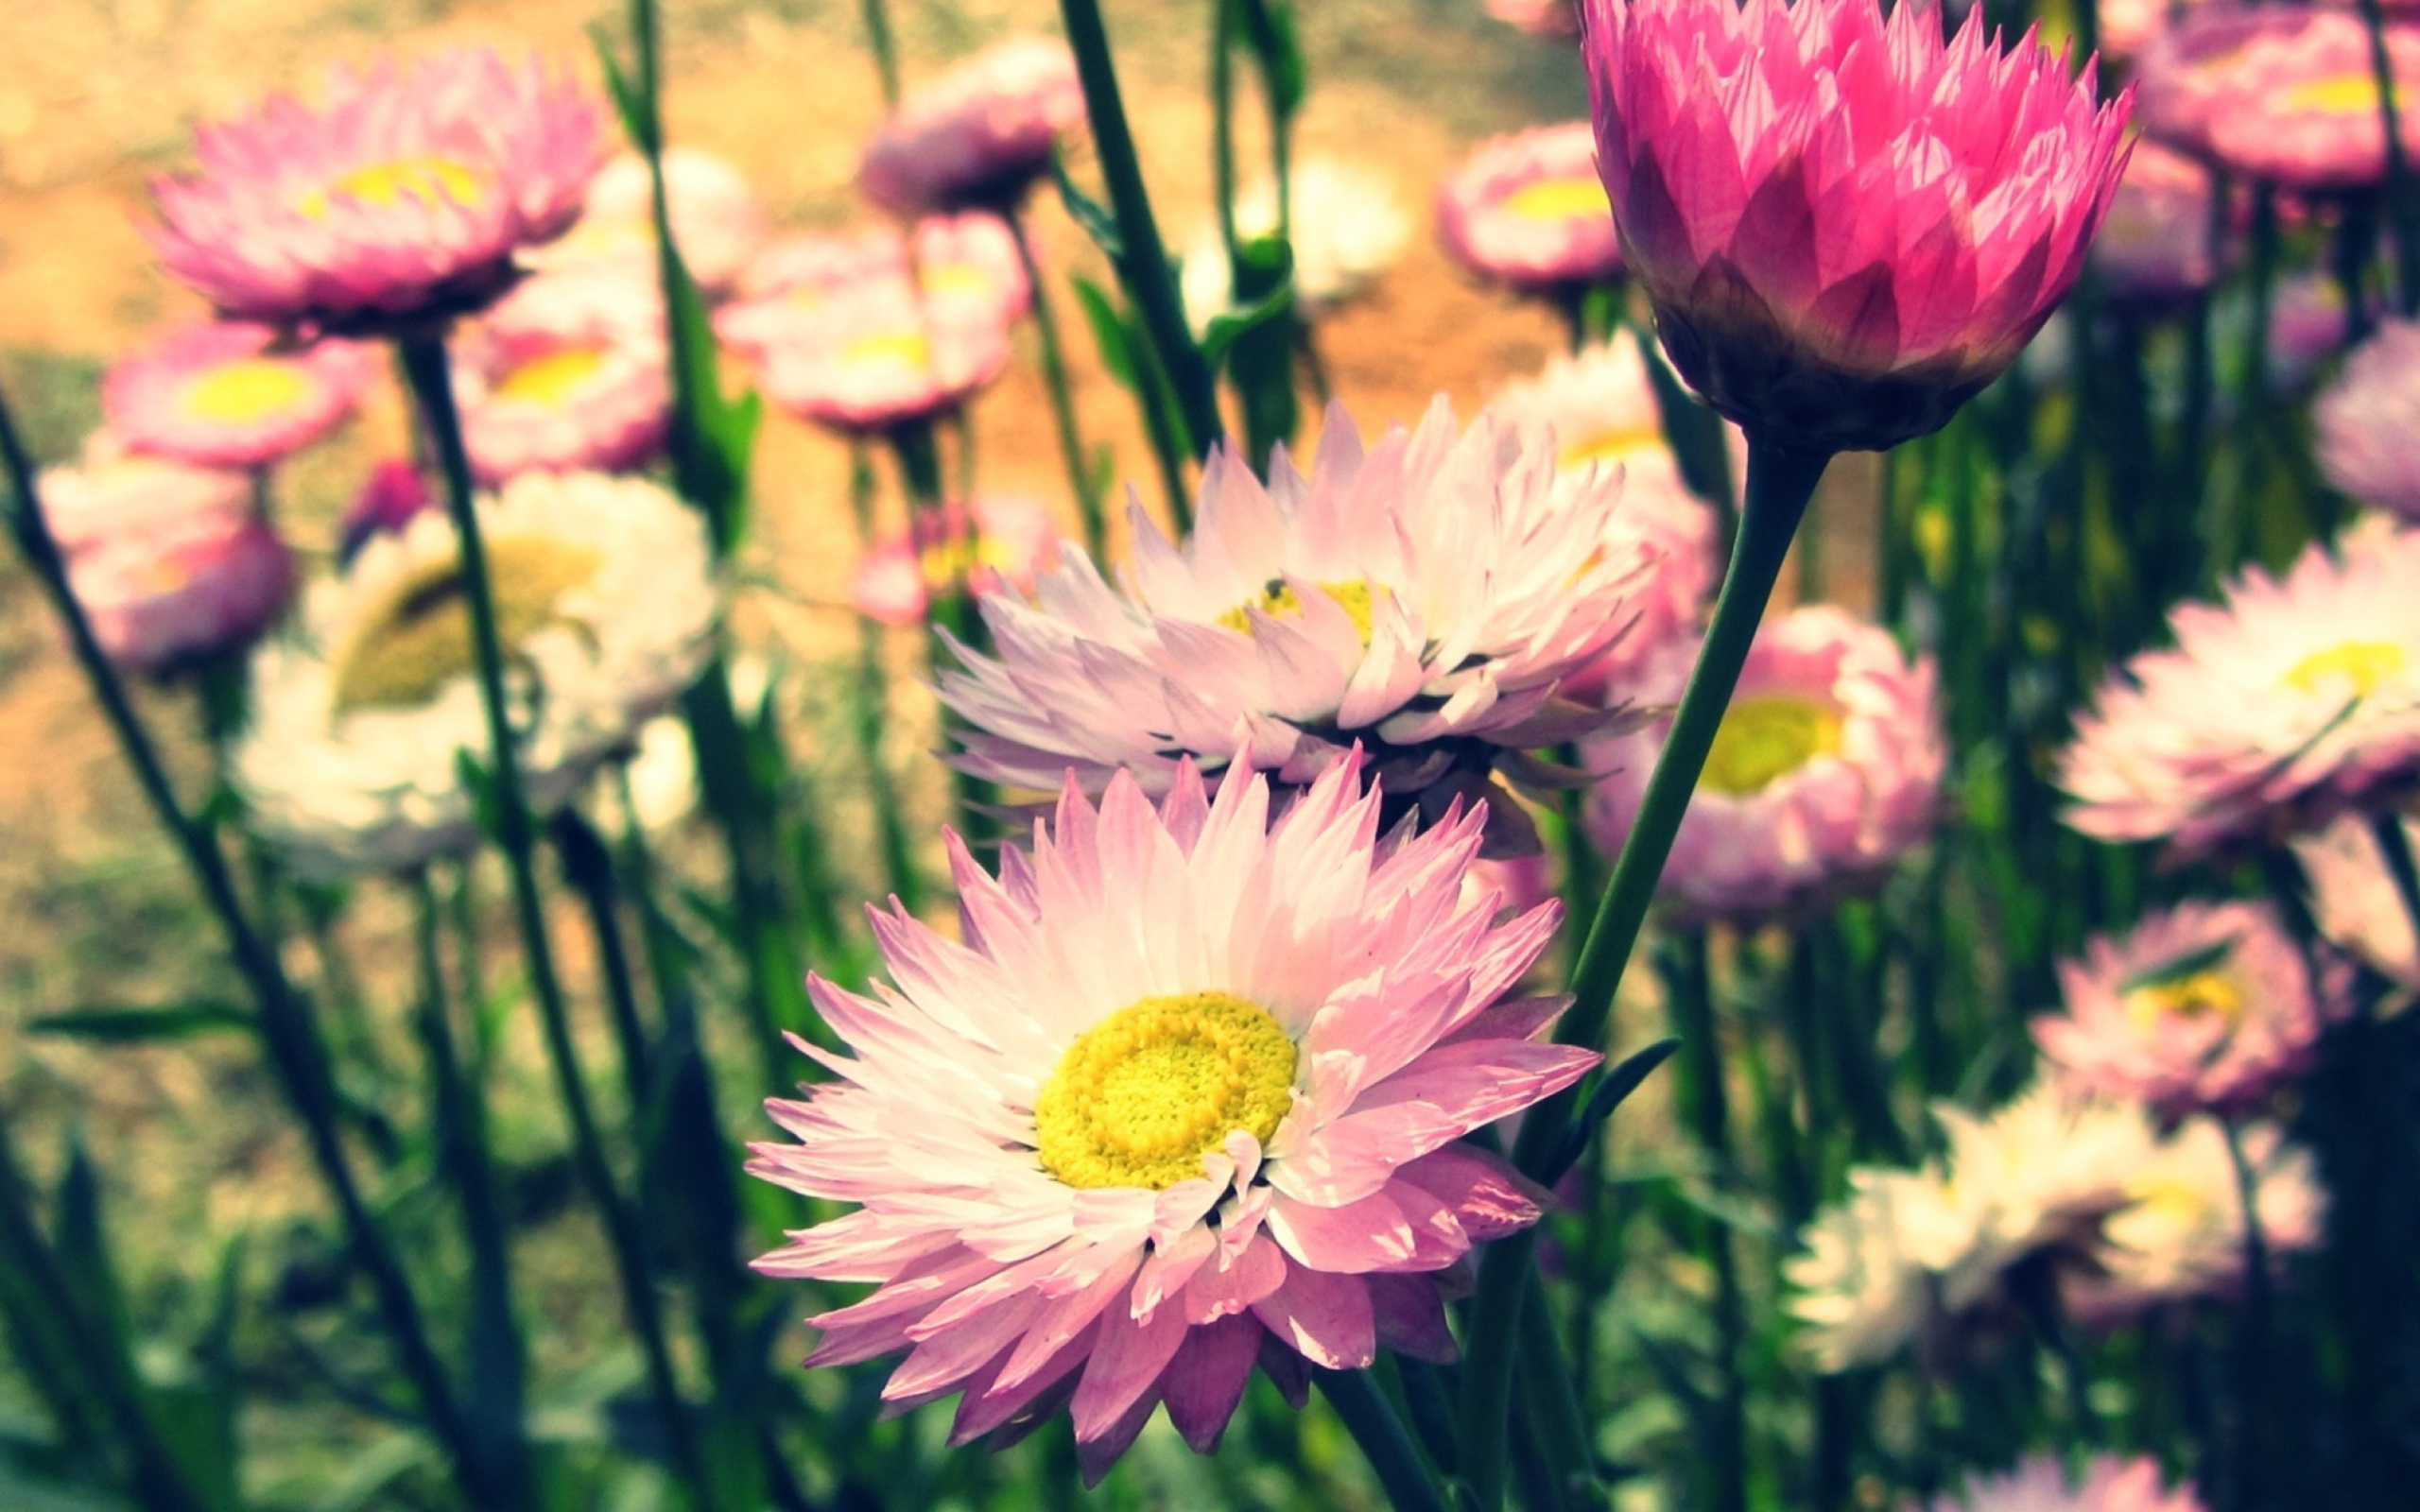 обои на телефон летние цветы джеки глаза